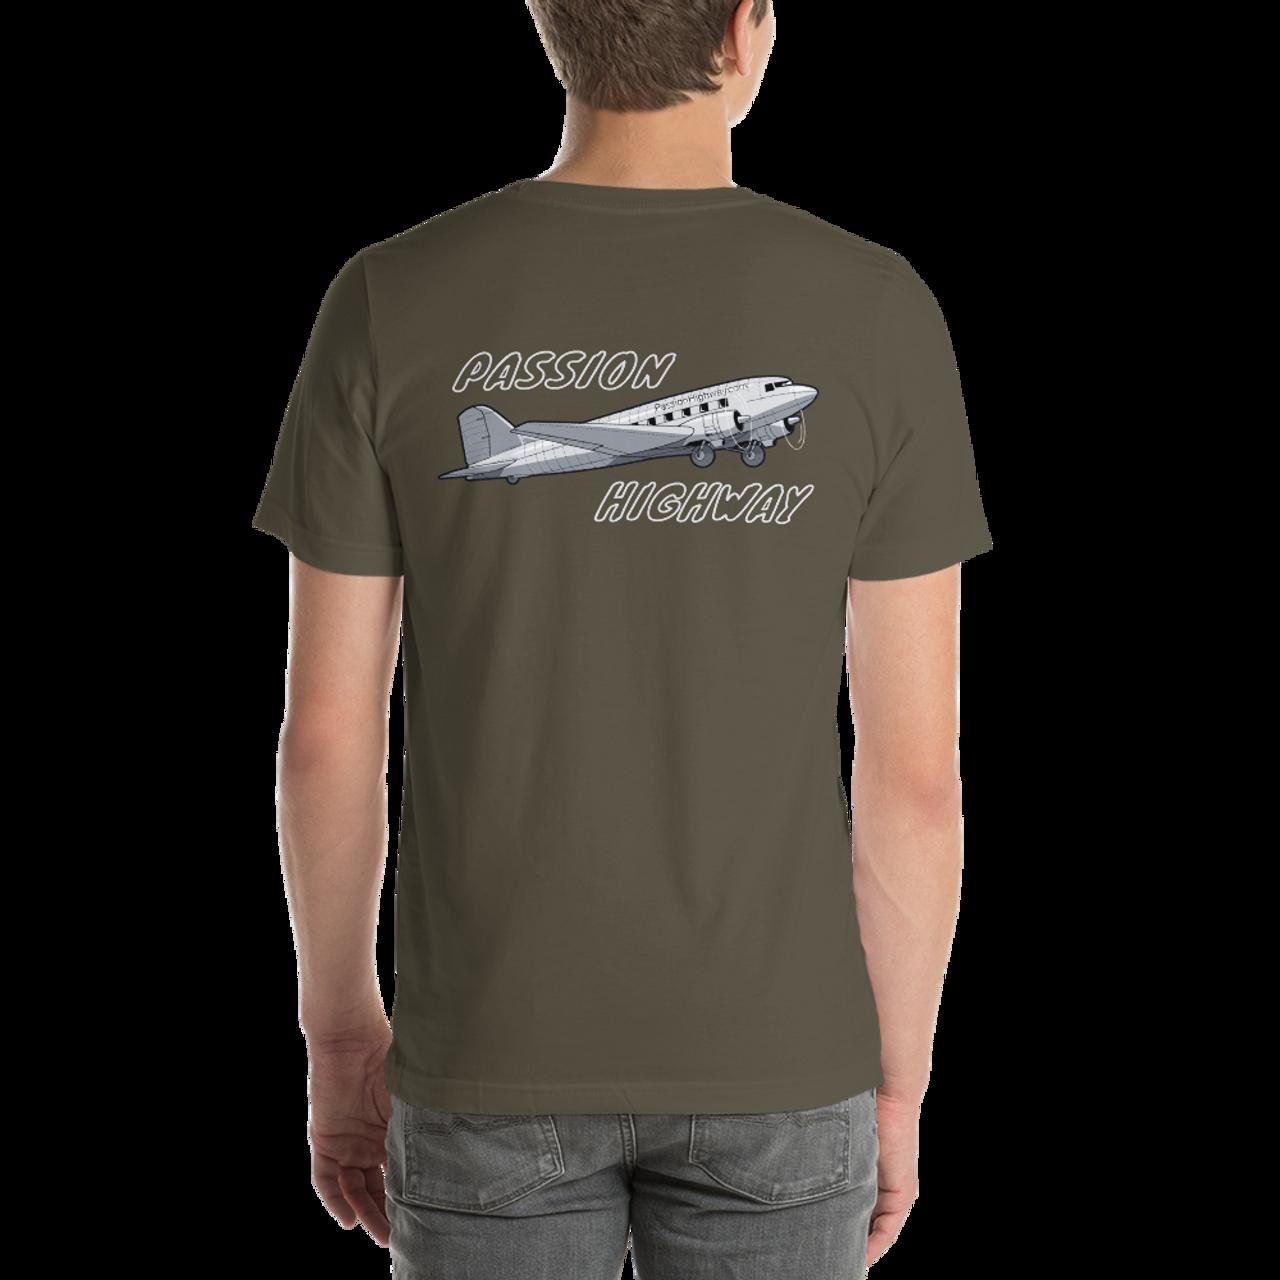 PH DC3 Aviation Graphic Tee